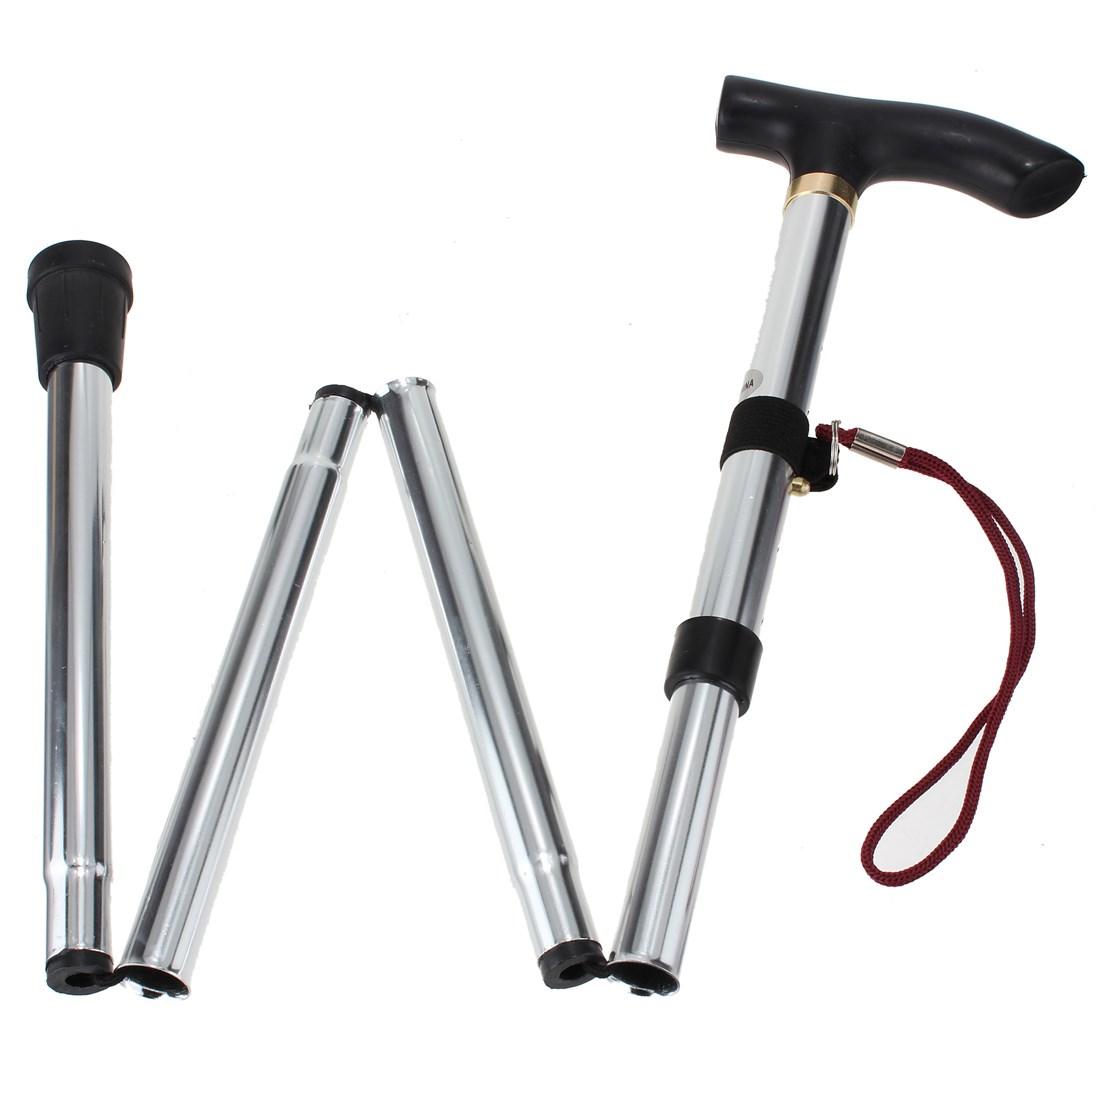 Hot Sale 4 Sections Foldable Adjustable Lightweight telescopic trekking poles Non-slip Cane Handle Hiking Walking Stick